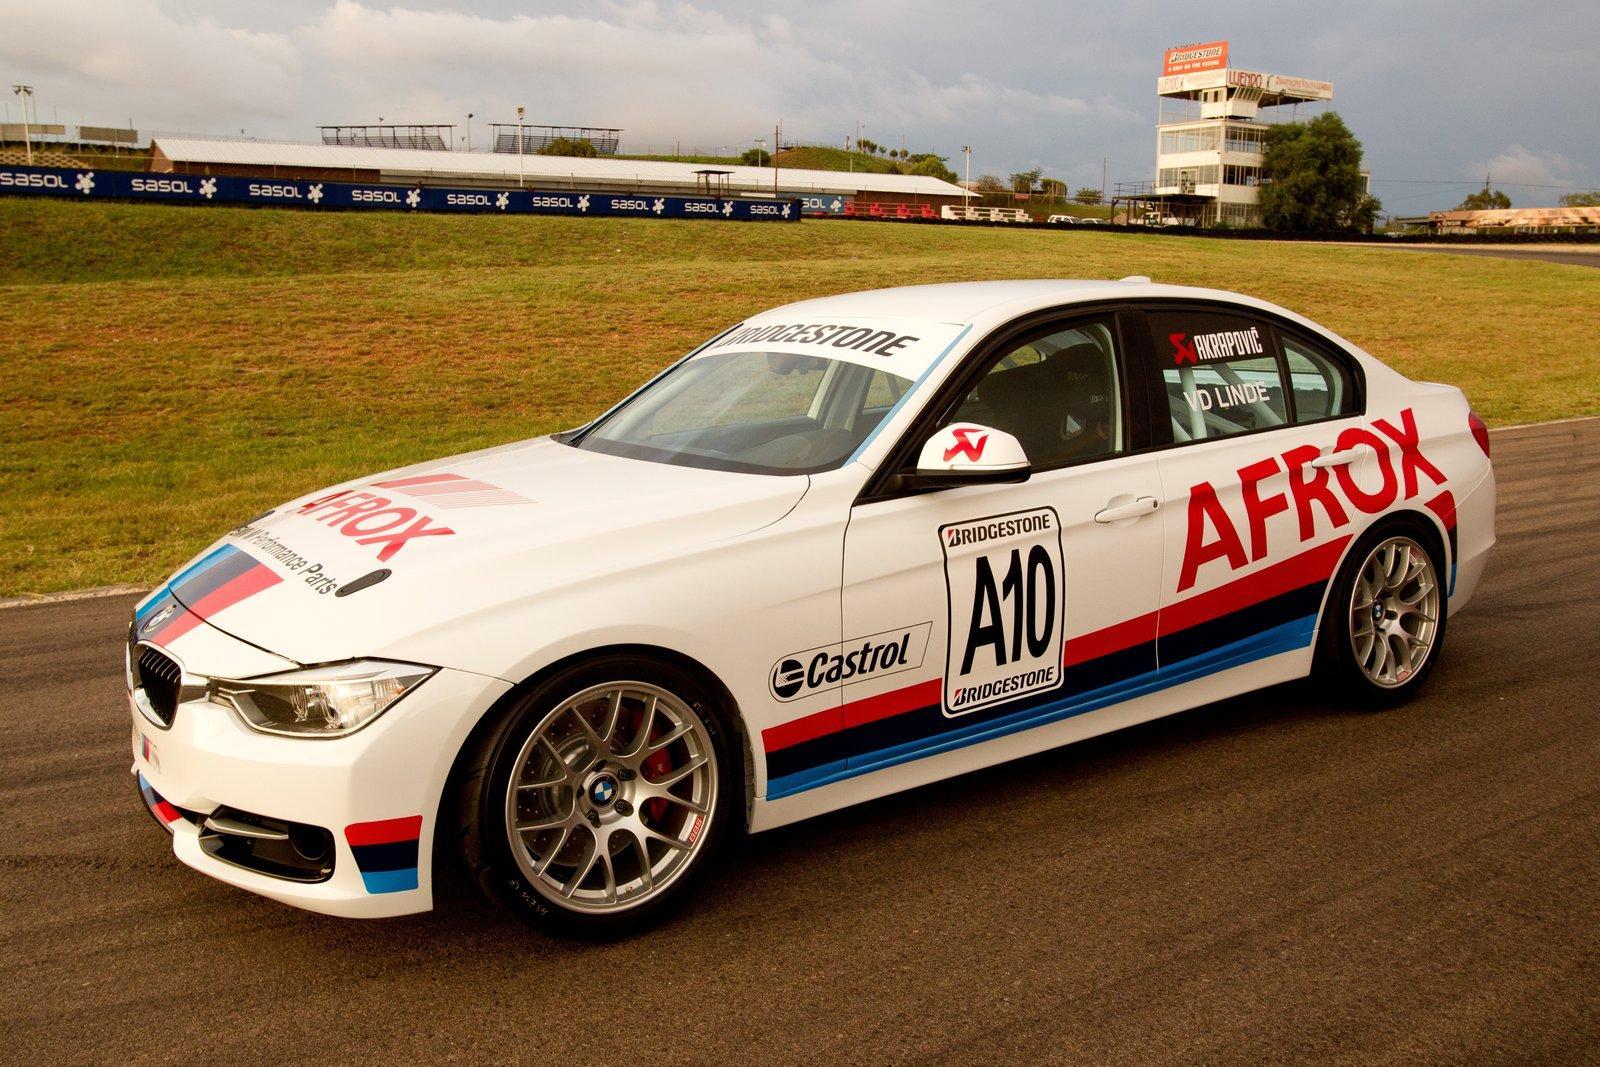 F30 BMW 3 Series racer